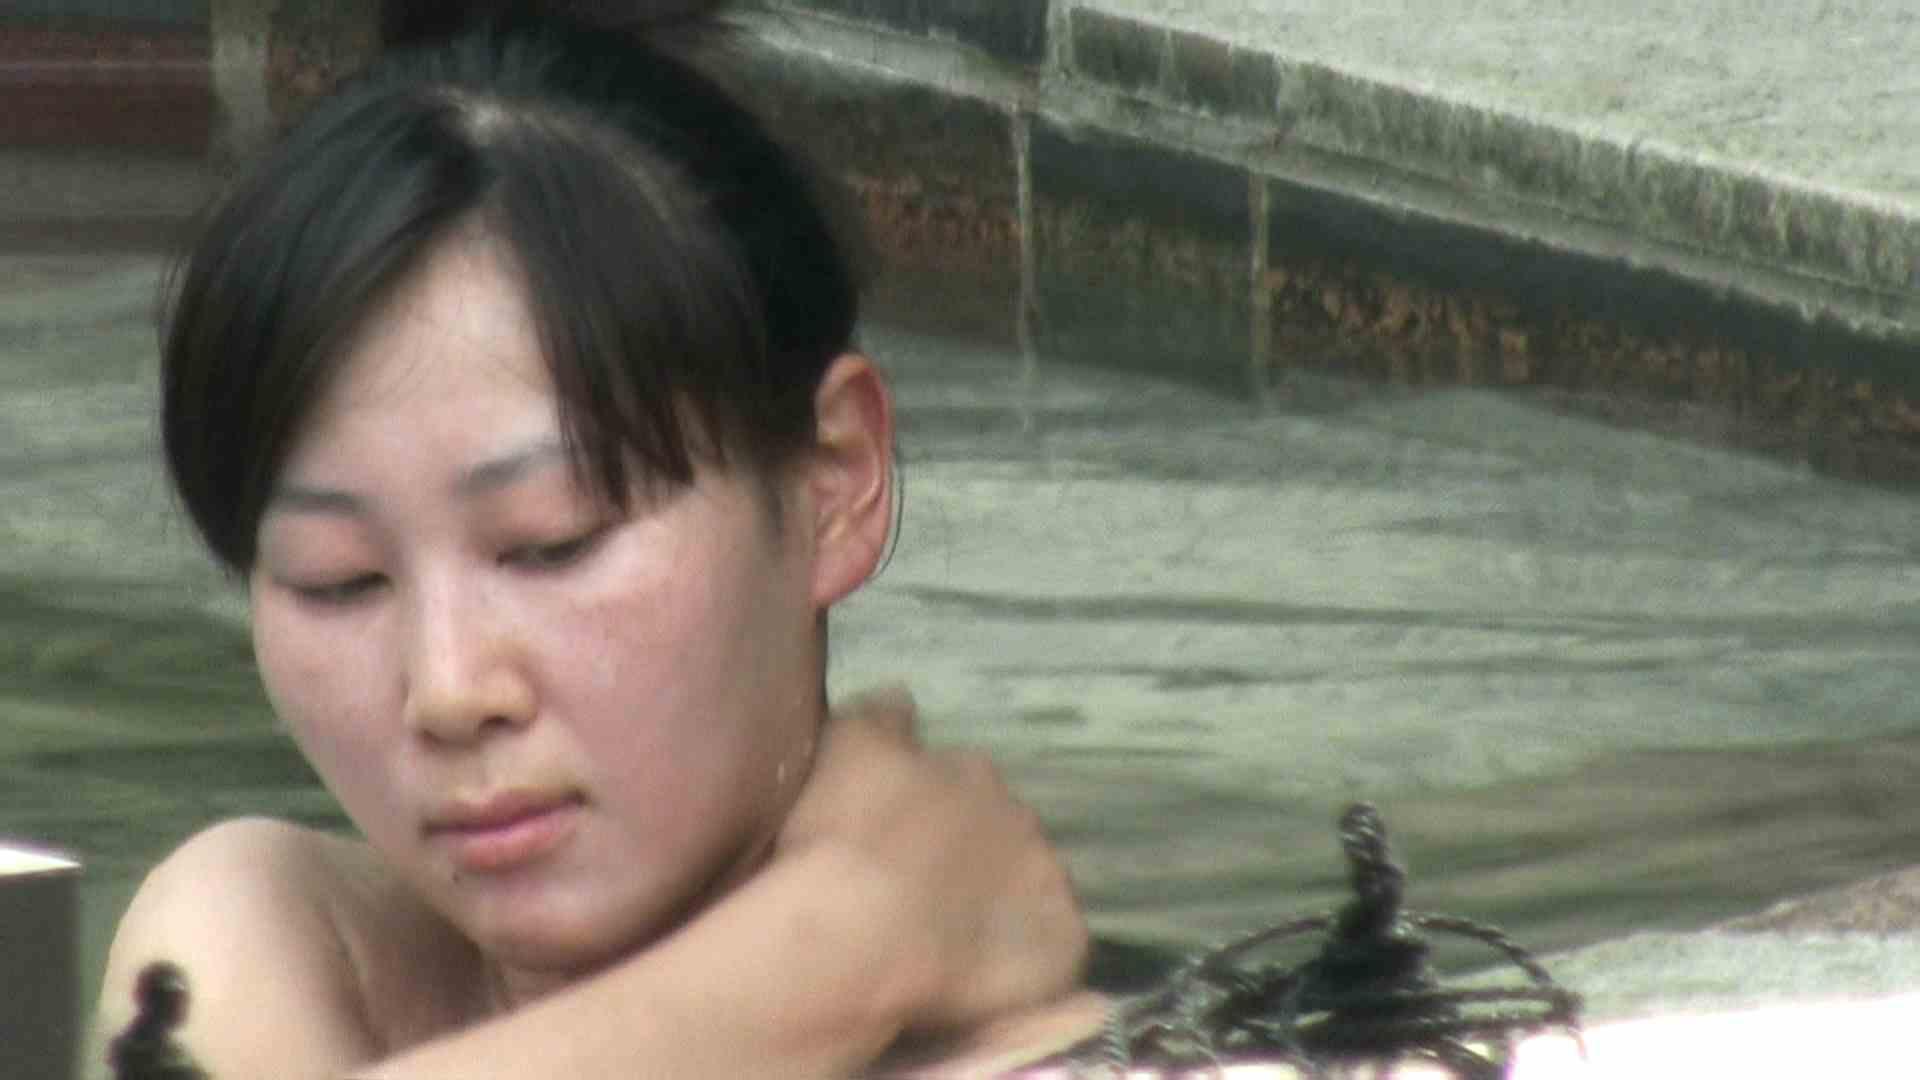 Aquaな露天風呂Vol.665 露天 アダルト動画キャプチャ 85枚 8